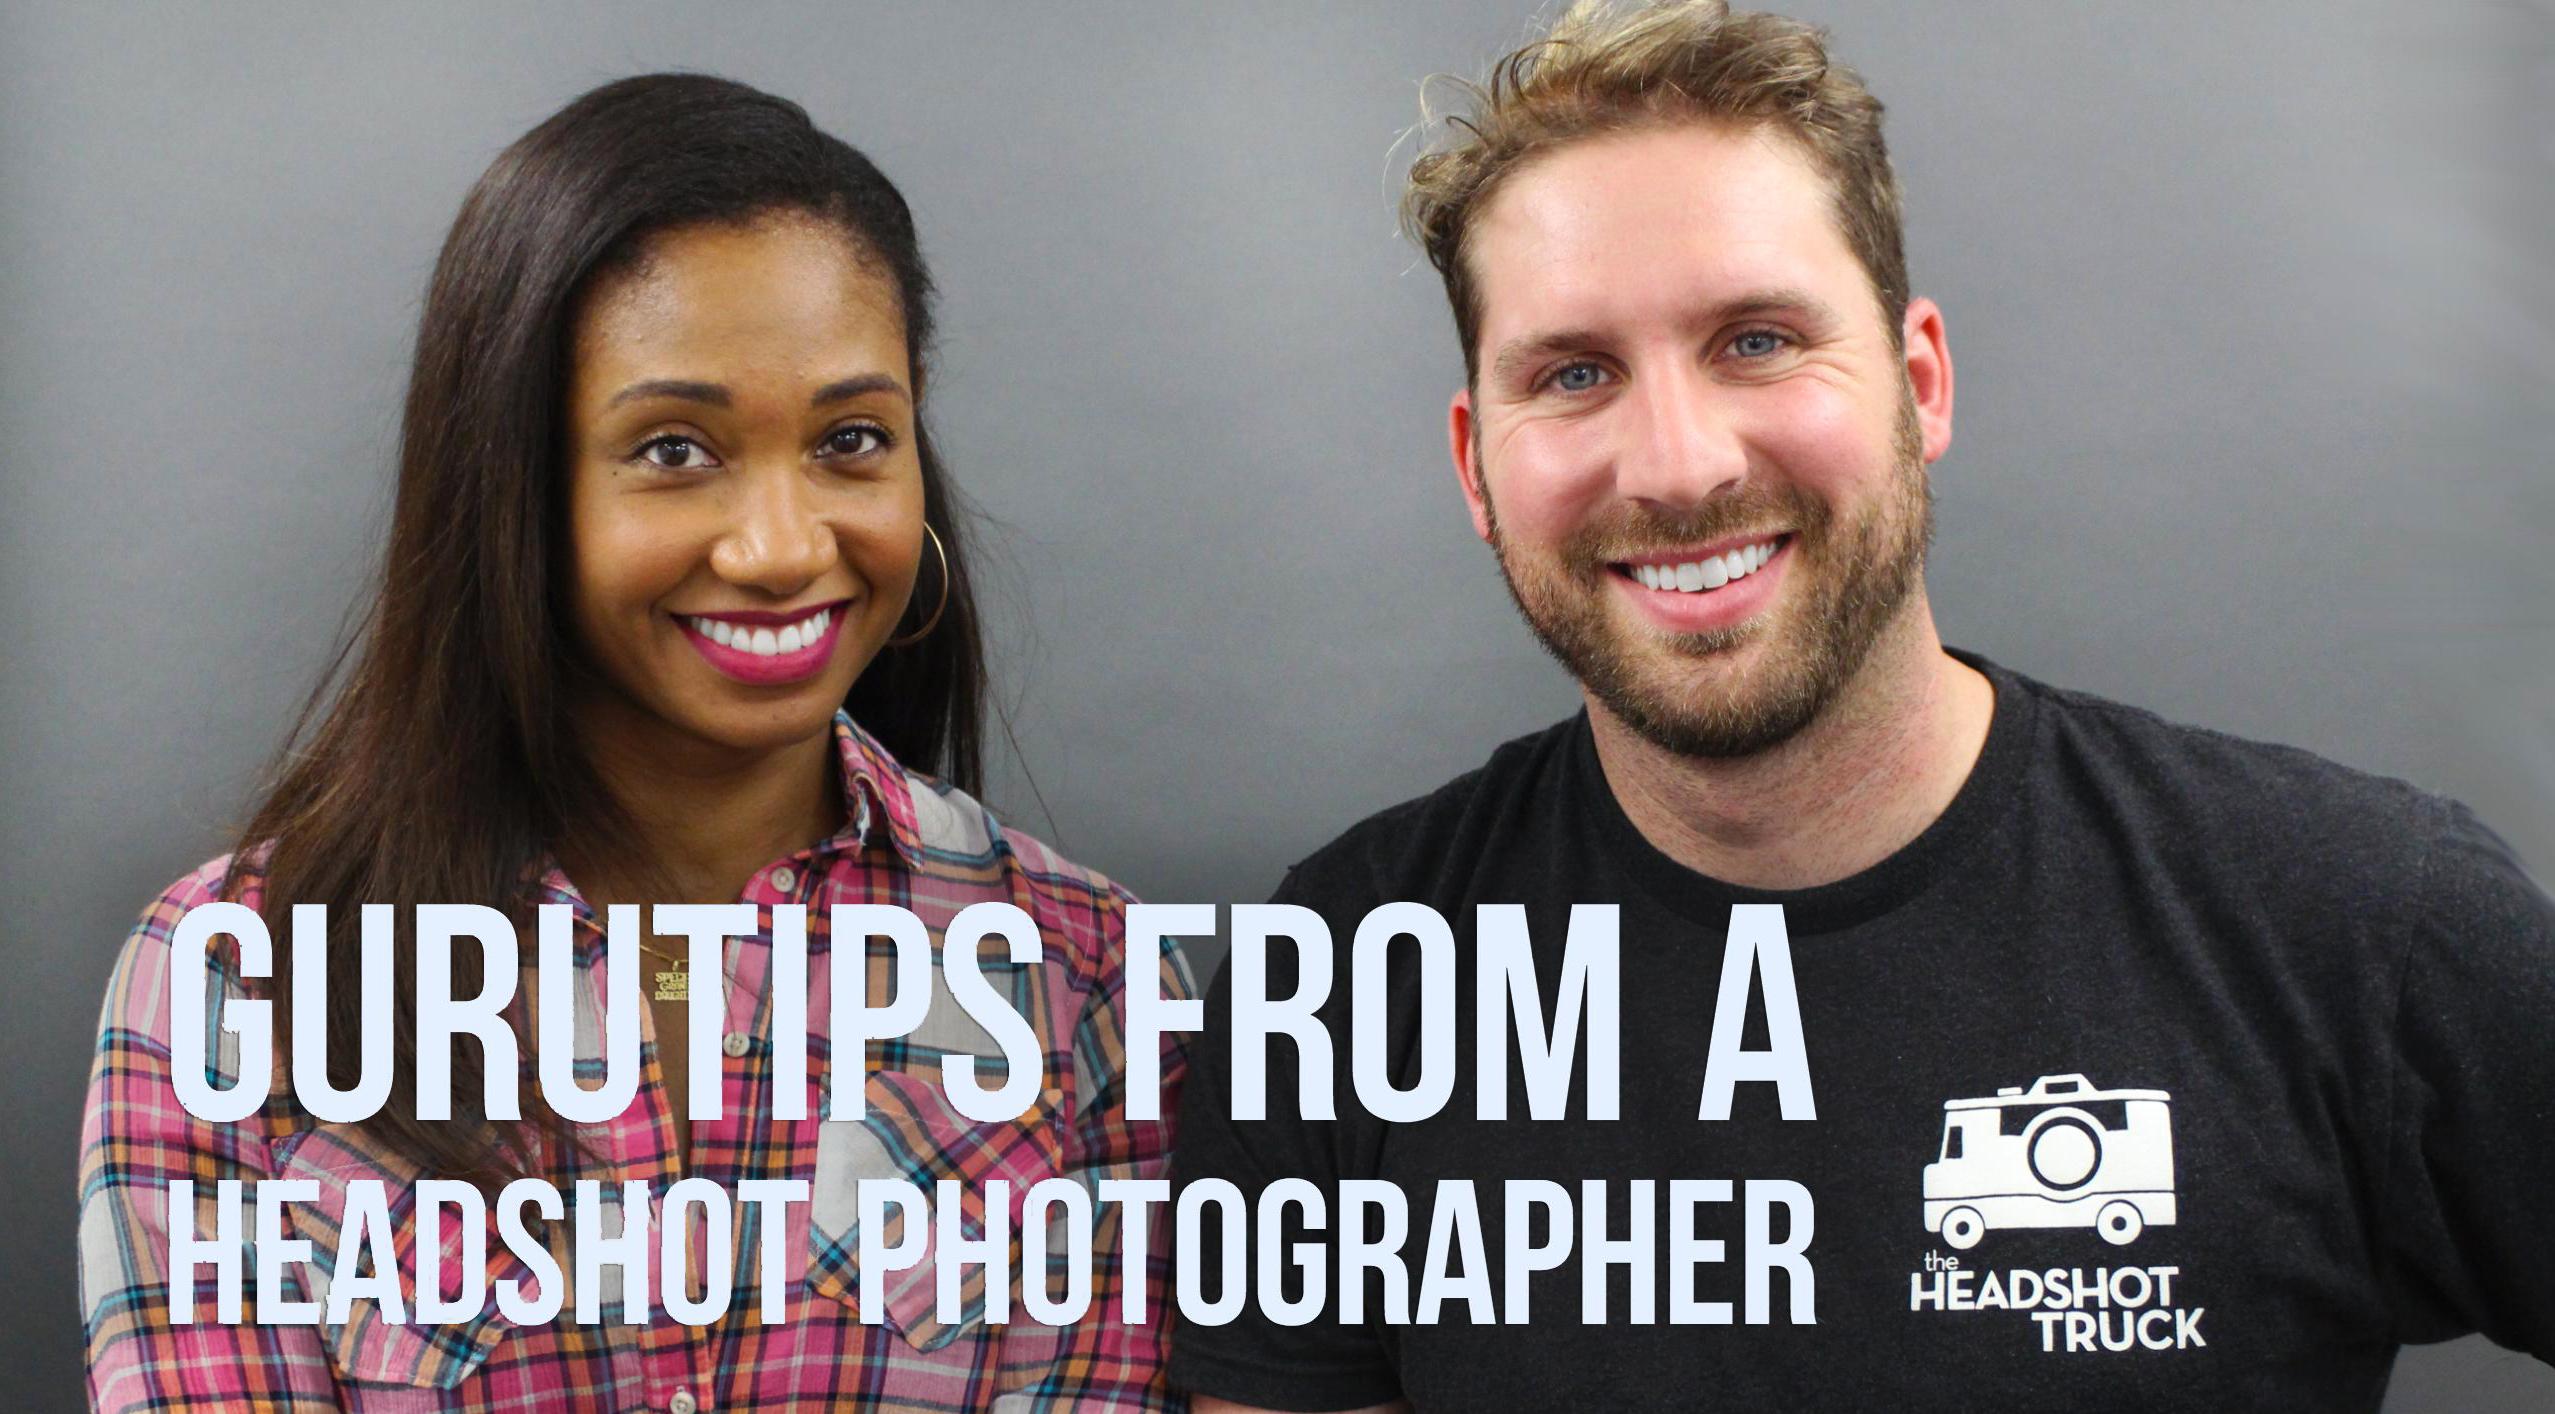 GuruTips From A Headshot Photographer (with The Headshot Truck!) | Workshop Guru